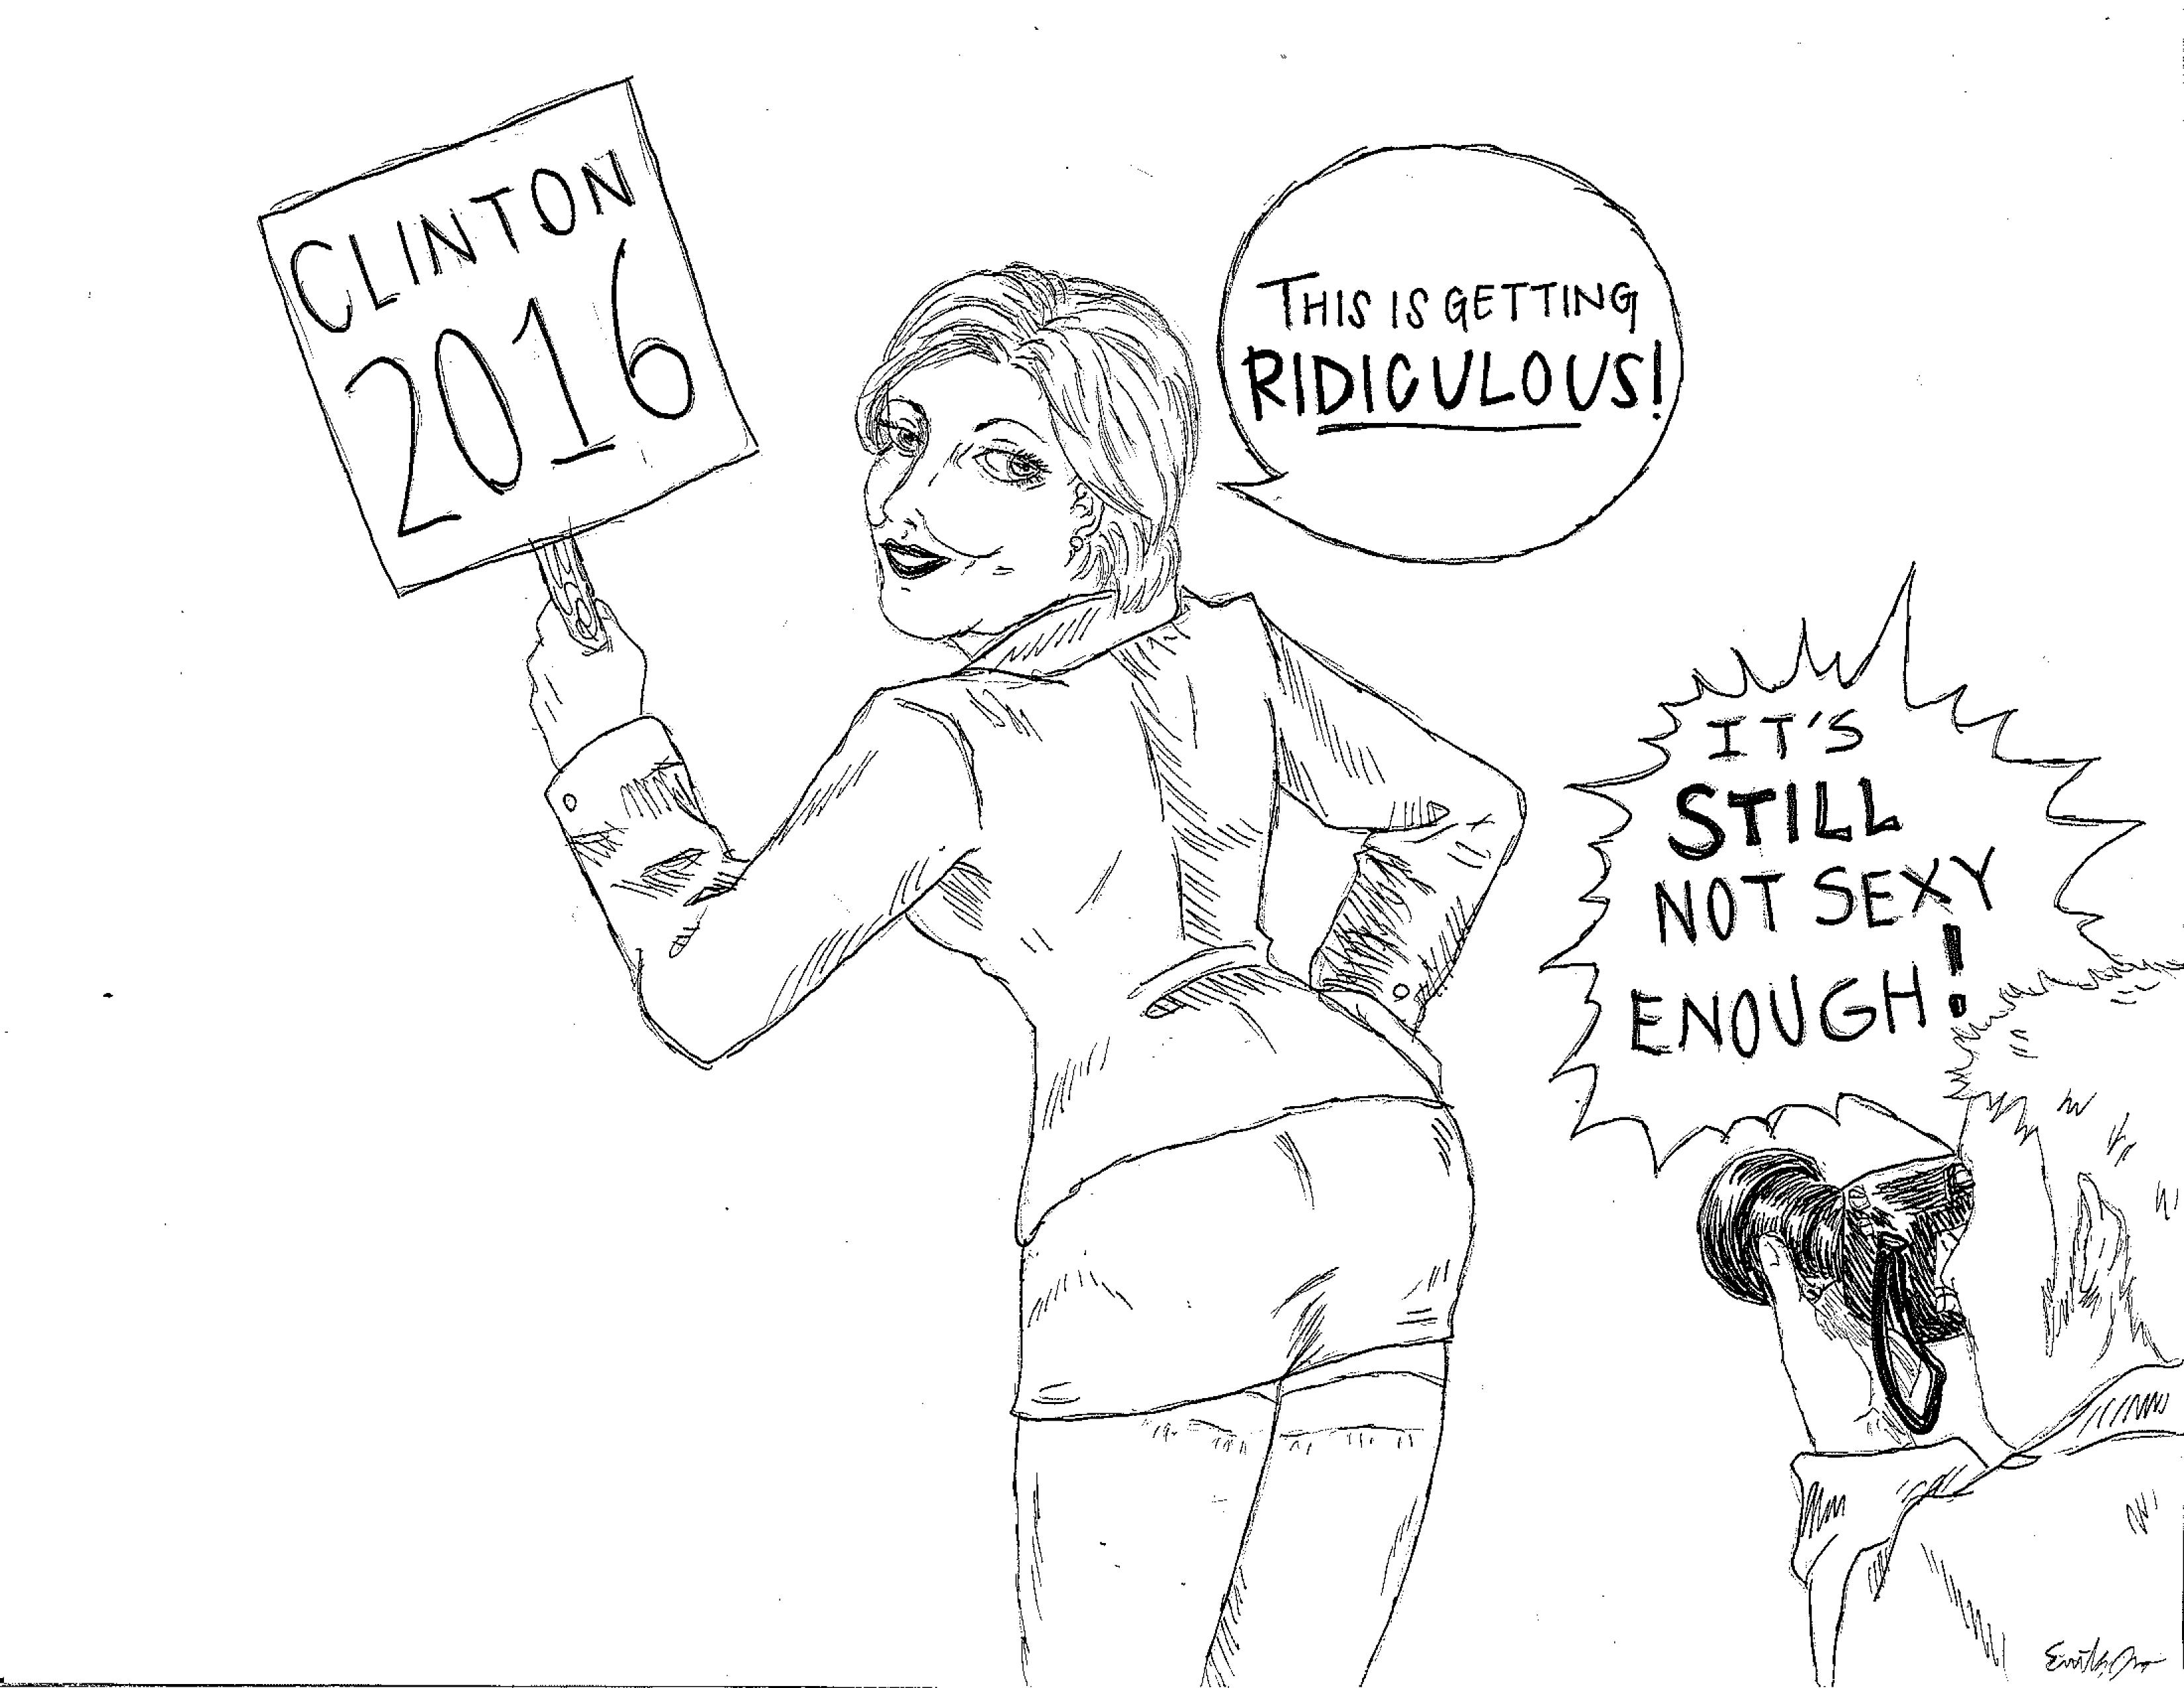 editorial cartoongrey